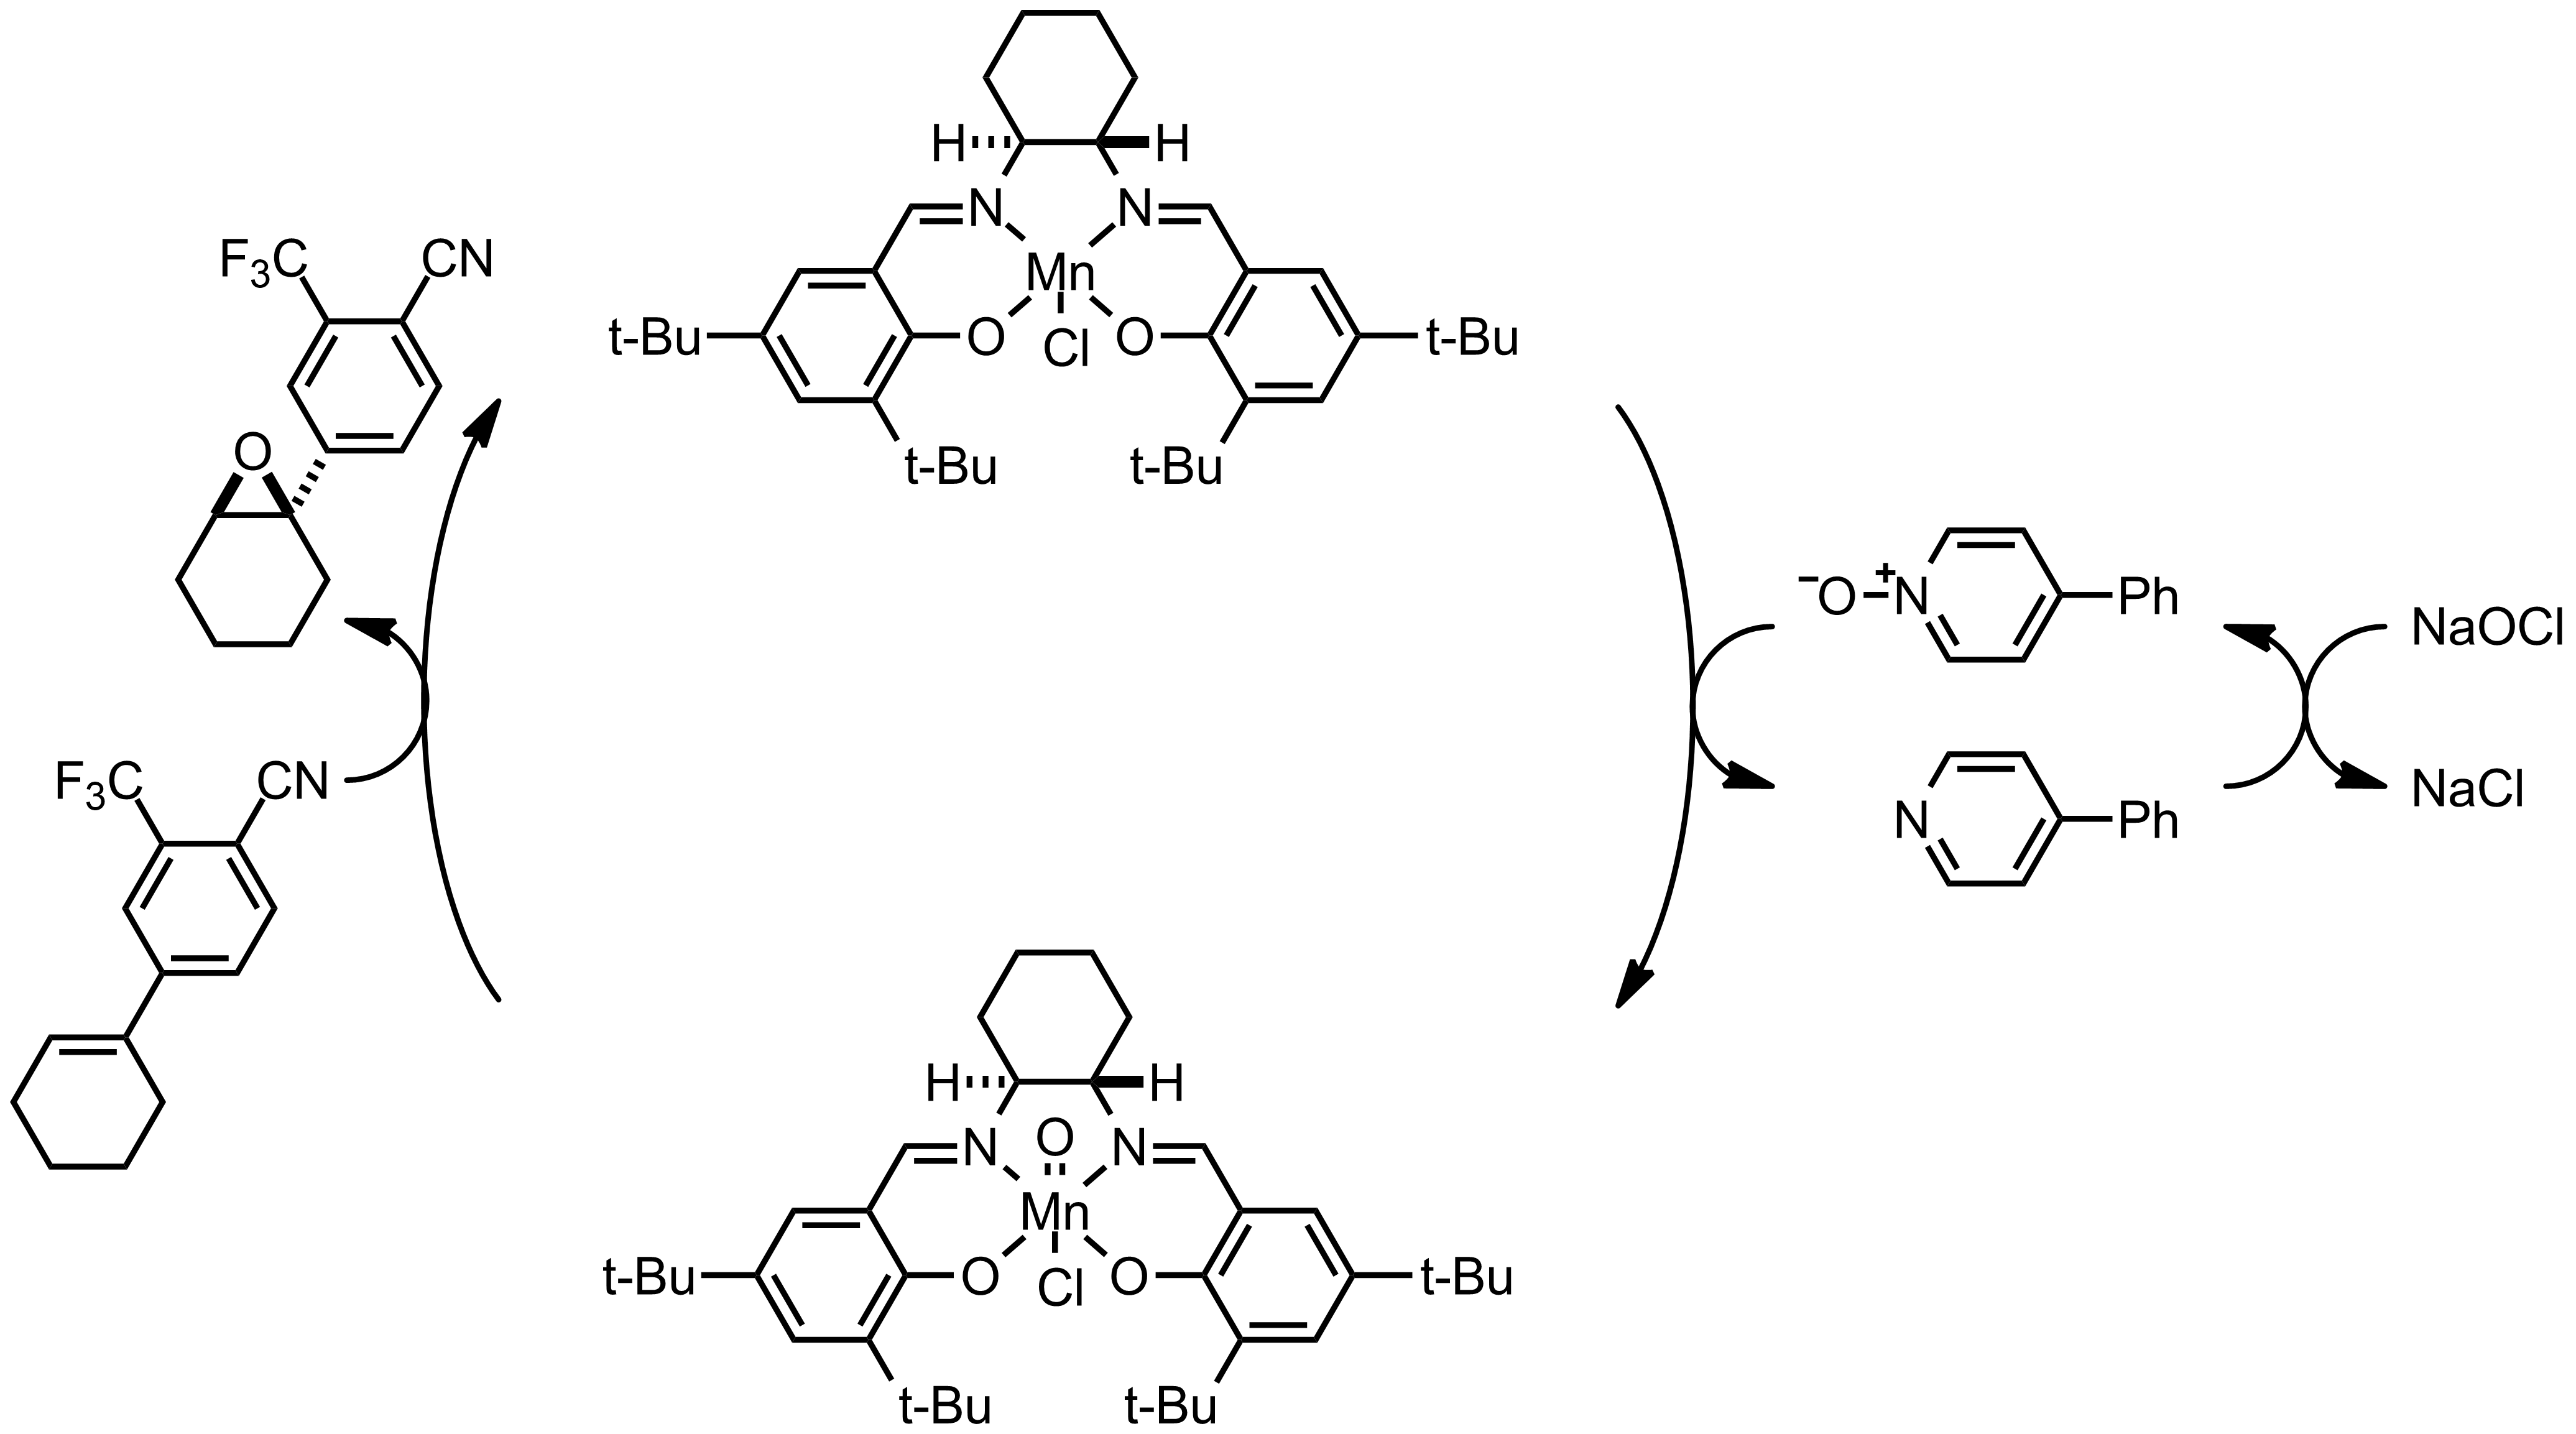 Mechanism of the Jacobsen-Katsuki Asymmetric Epoxidation